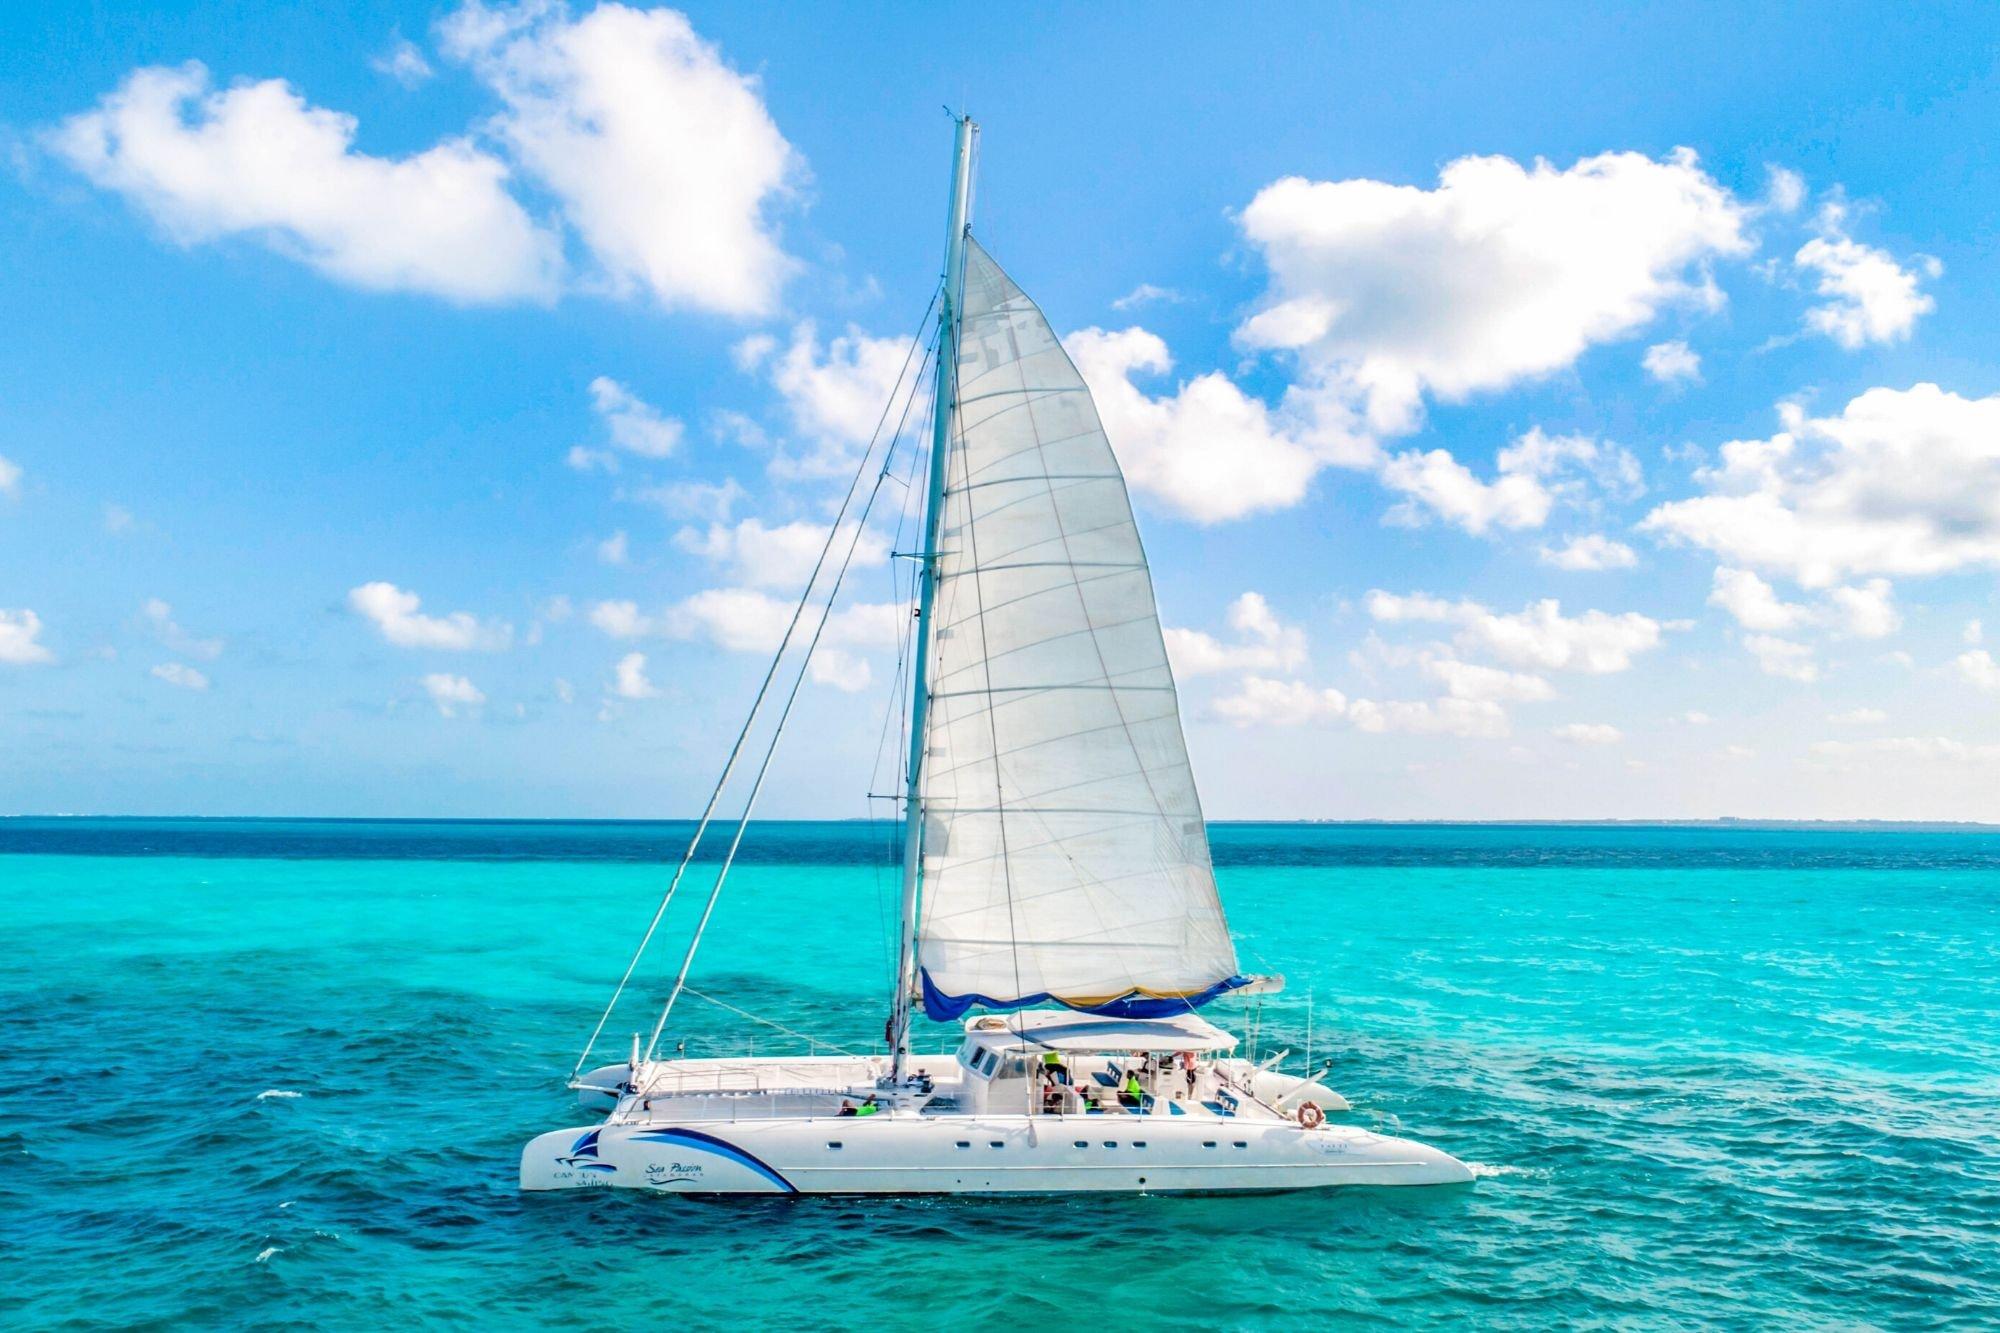 7 - HiRes - Sea Passion III - Isla Mujeres Catamaran Tour - Cancun Sailing